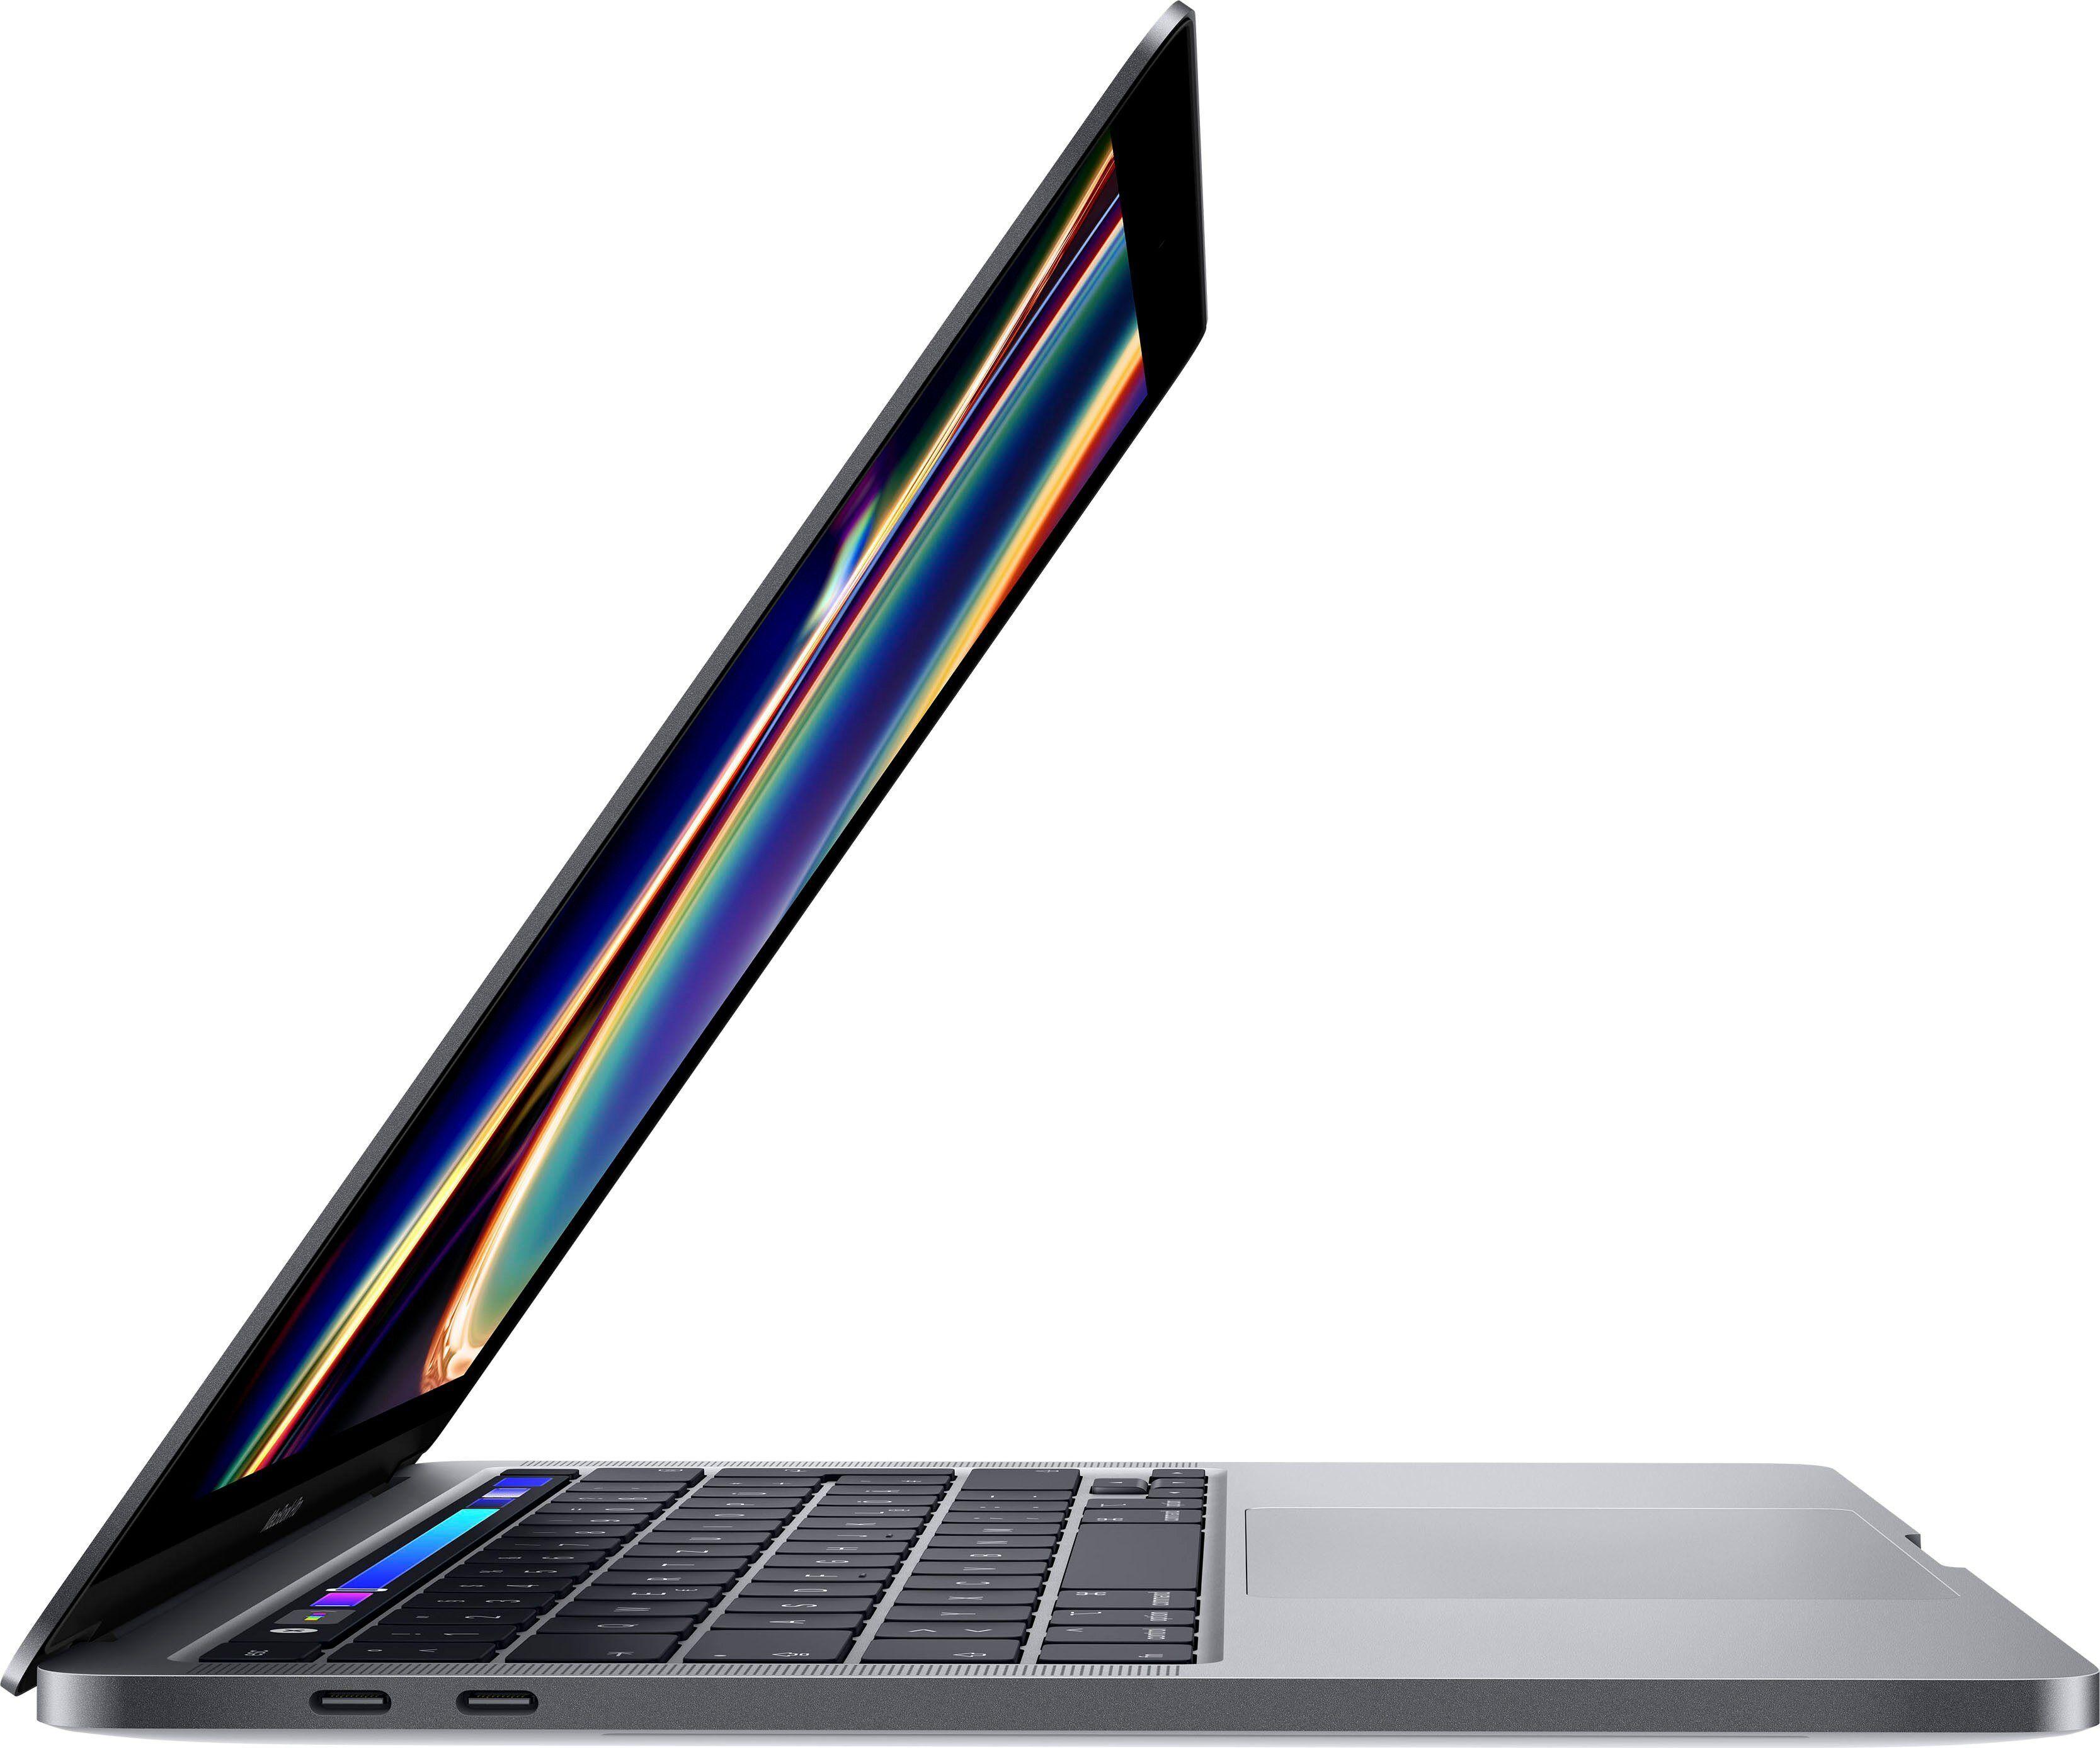 Apple MacBook Pro Notebook (33,78 cm/13,3 Zoll, Intel Core i5, Iris Plus Graphics 645, - GB HDD, 512 GB SSD), space Grau